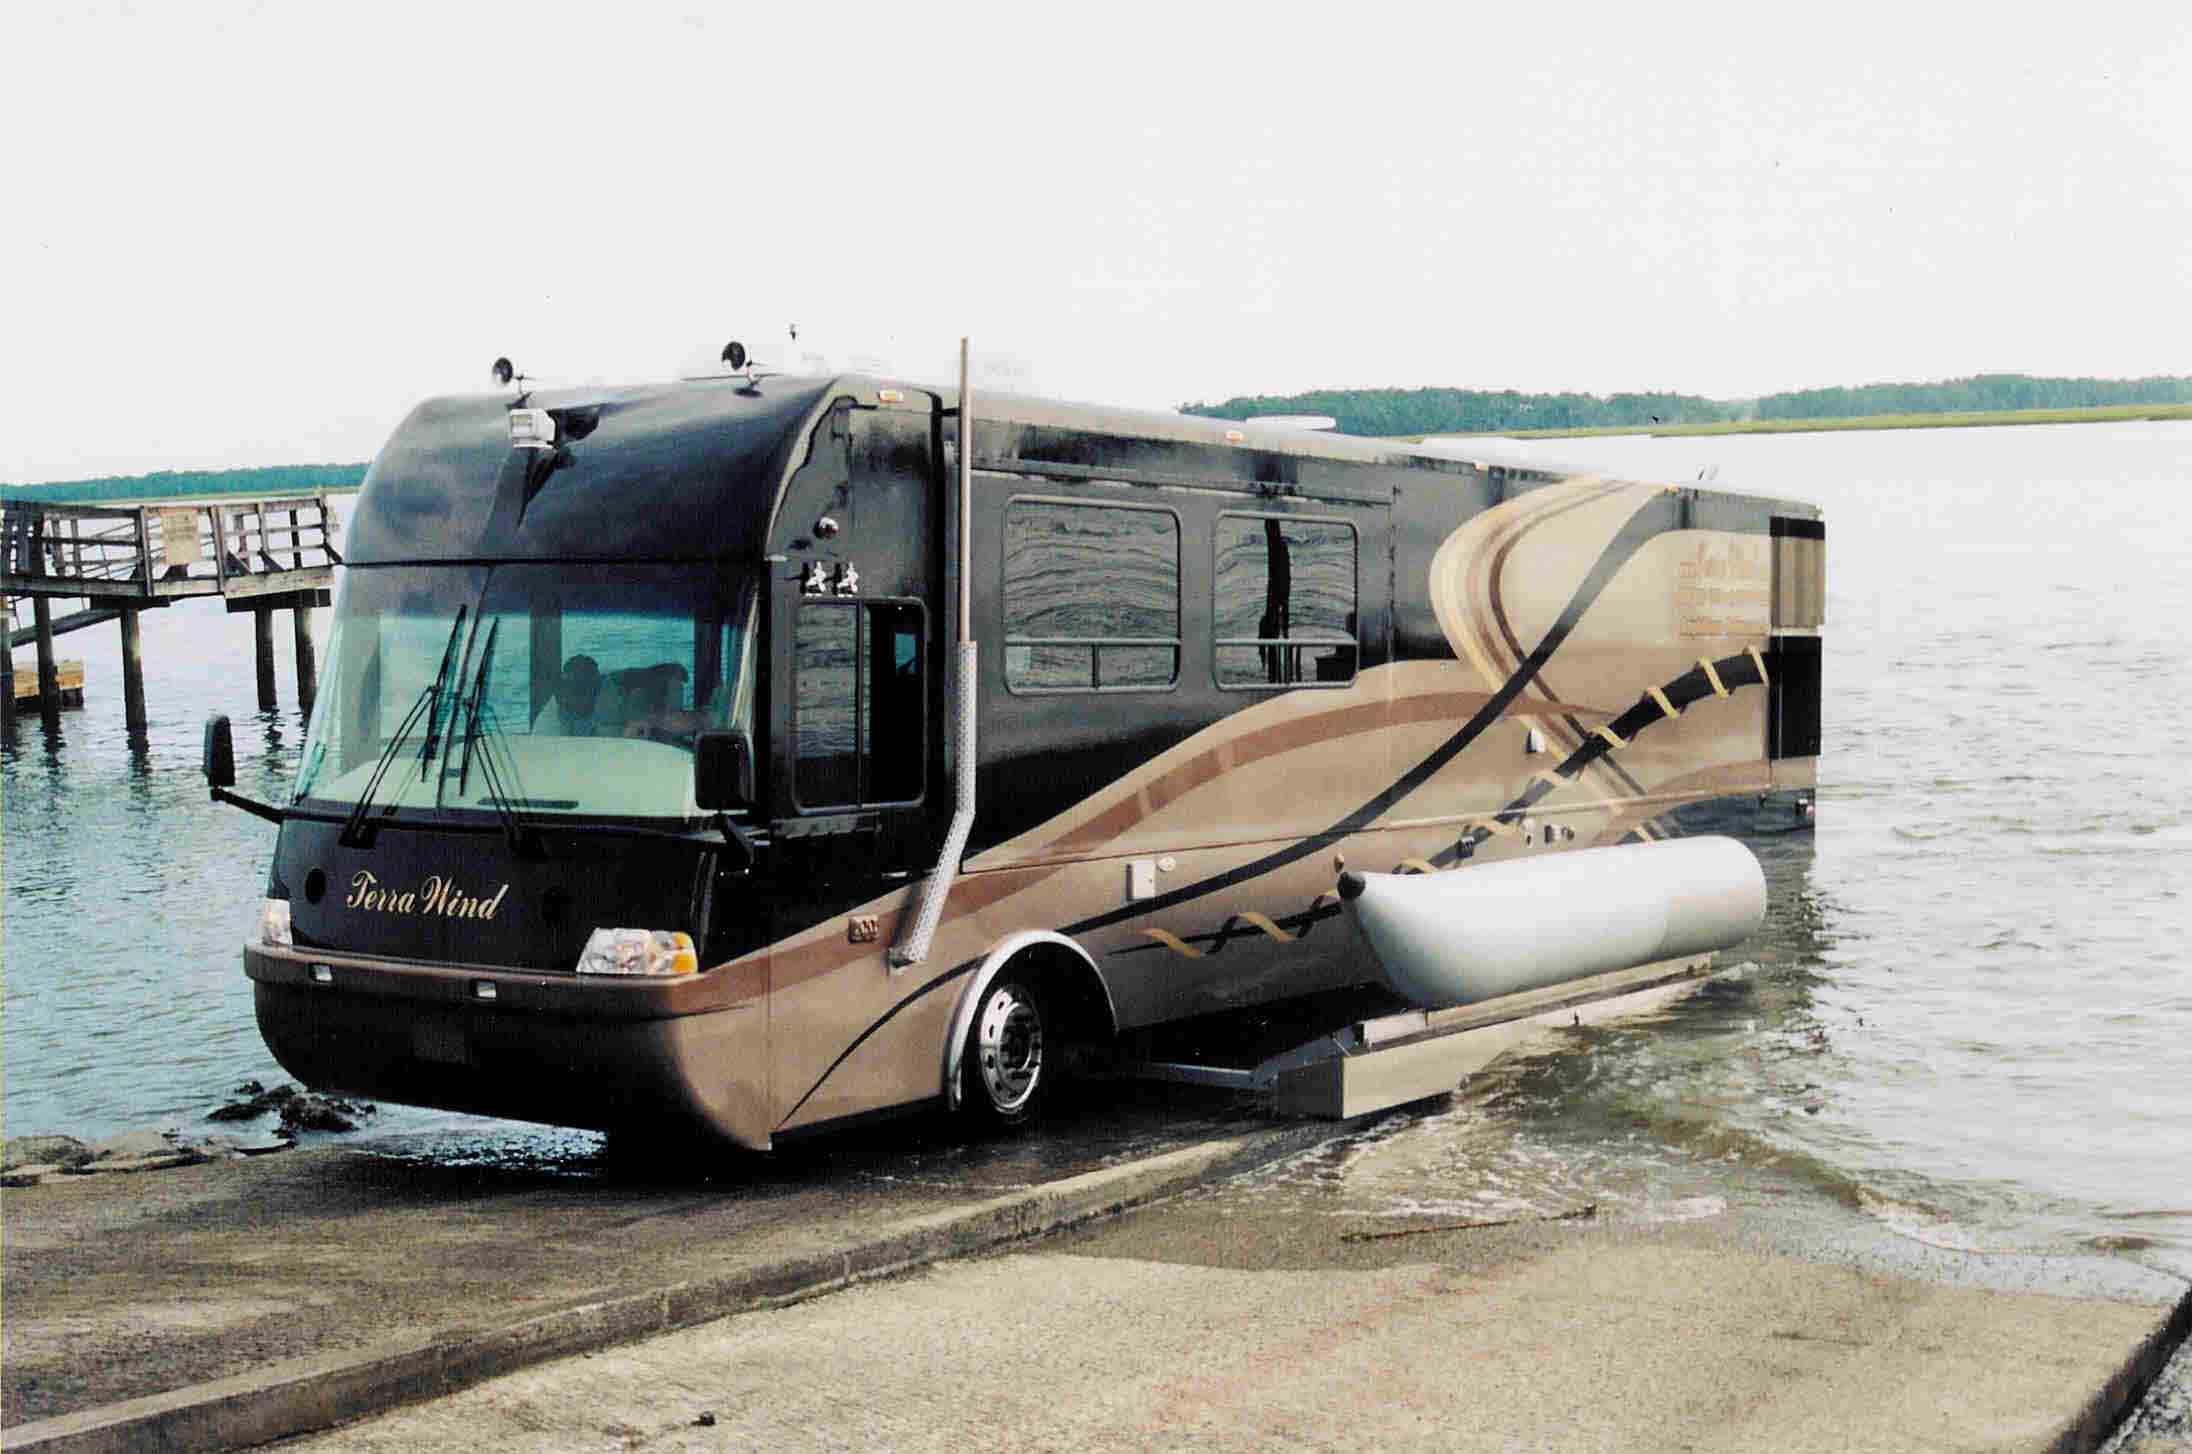 Terra Wind » : Le Camping-Car Grand Luxe Amphibie Qui ... pour Camping Car De Luxe Avec Piscine